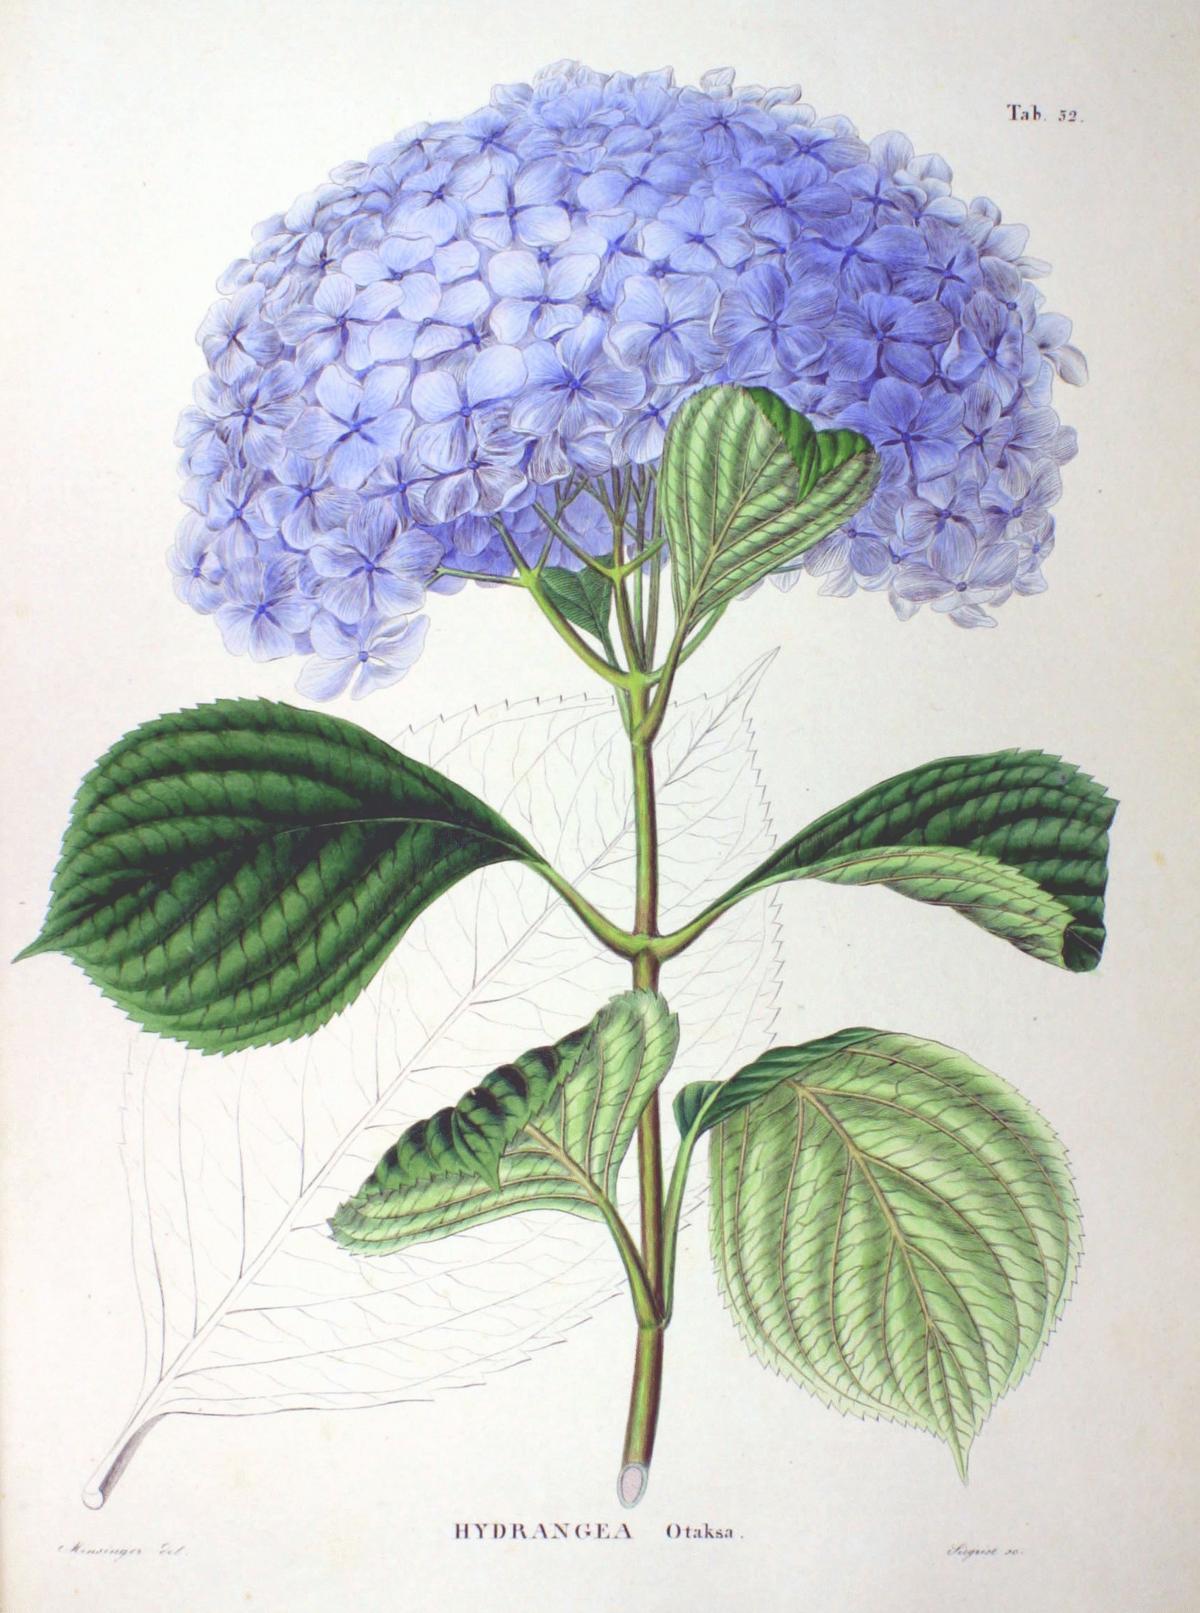 Hydrangea macrophylla wikipedia la enciclopedia libre for Colore ortensia